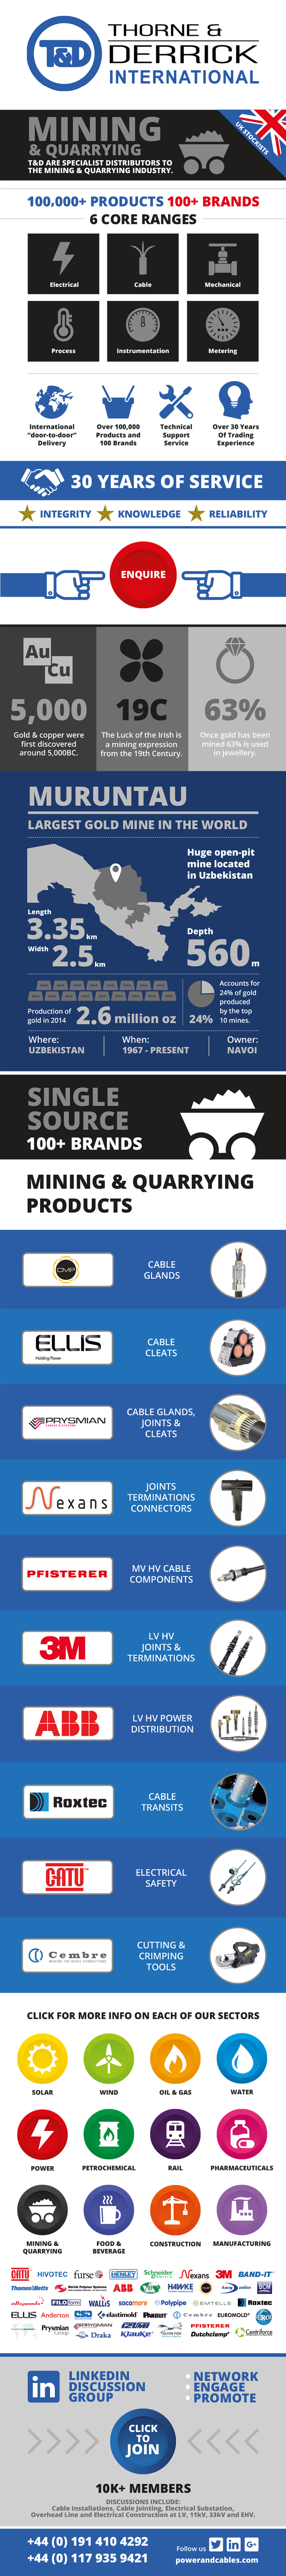 Mining Infographic